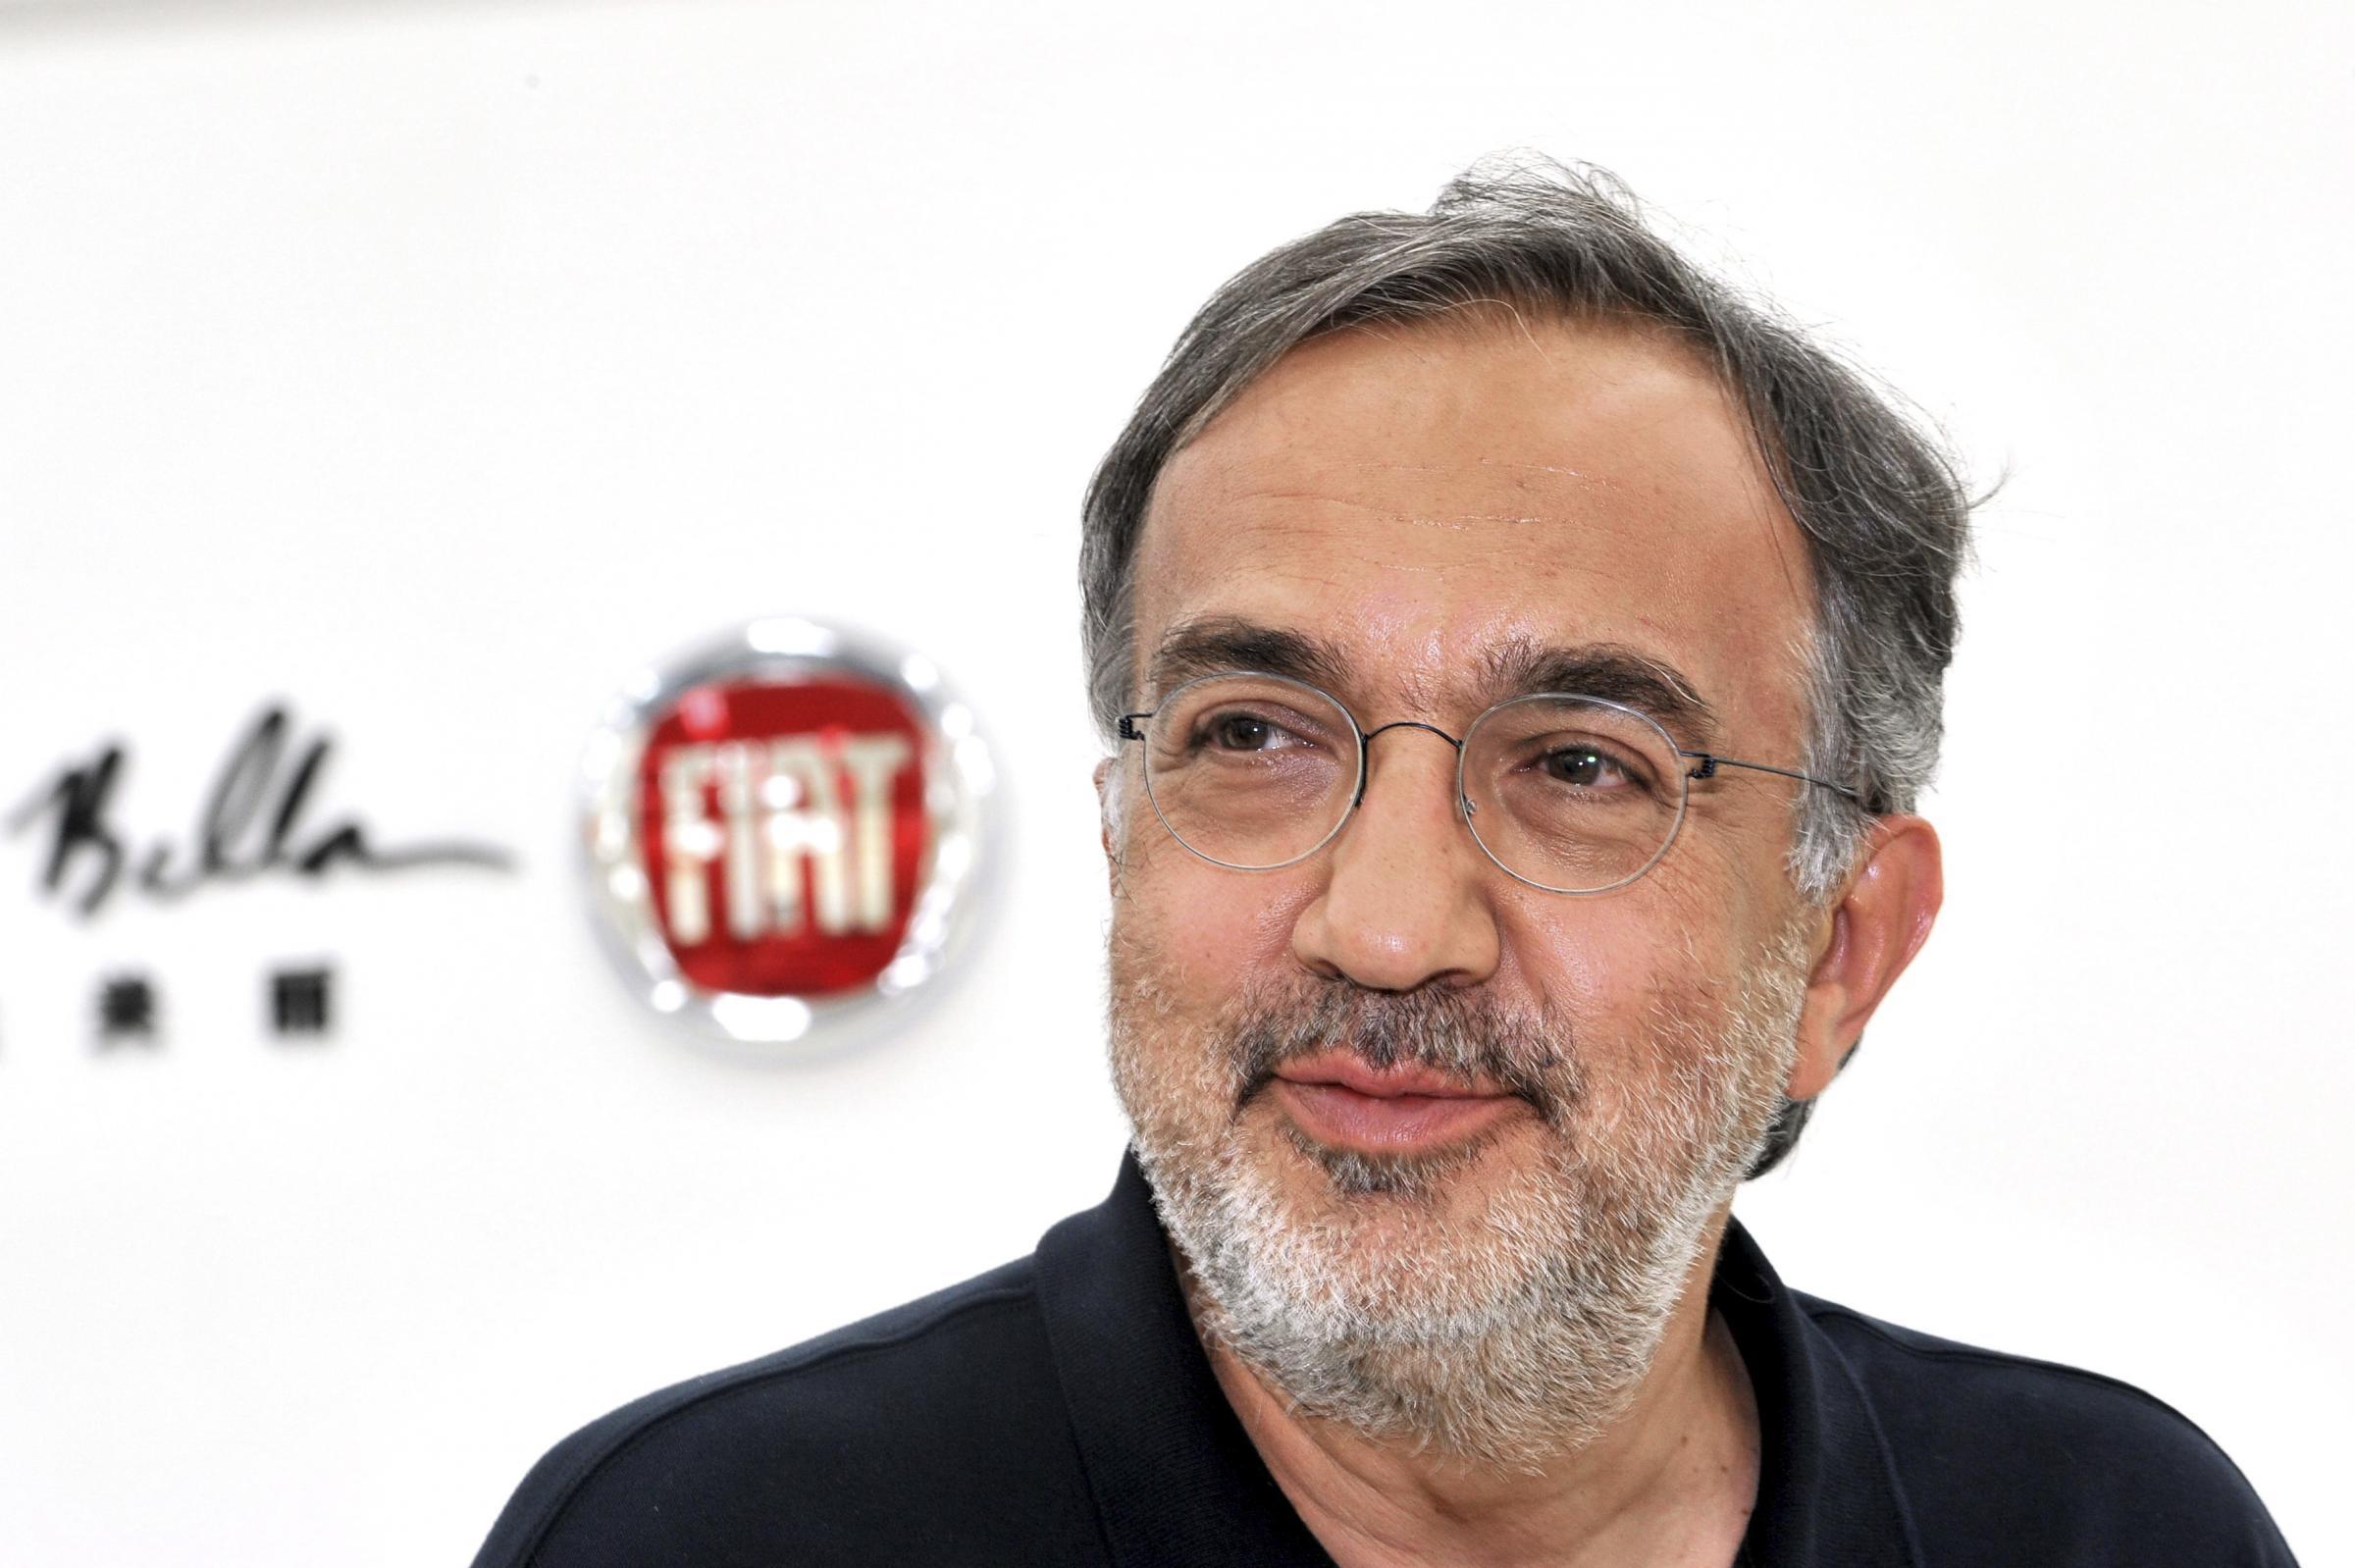 Sergio Marchionne biografia vita e storia Le patron de Fiat confirme (un peu) larrivée dApple dans lautomobile